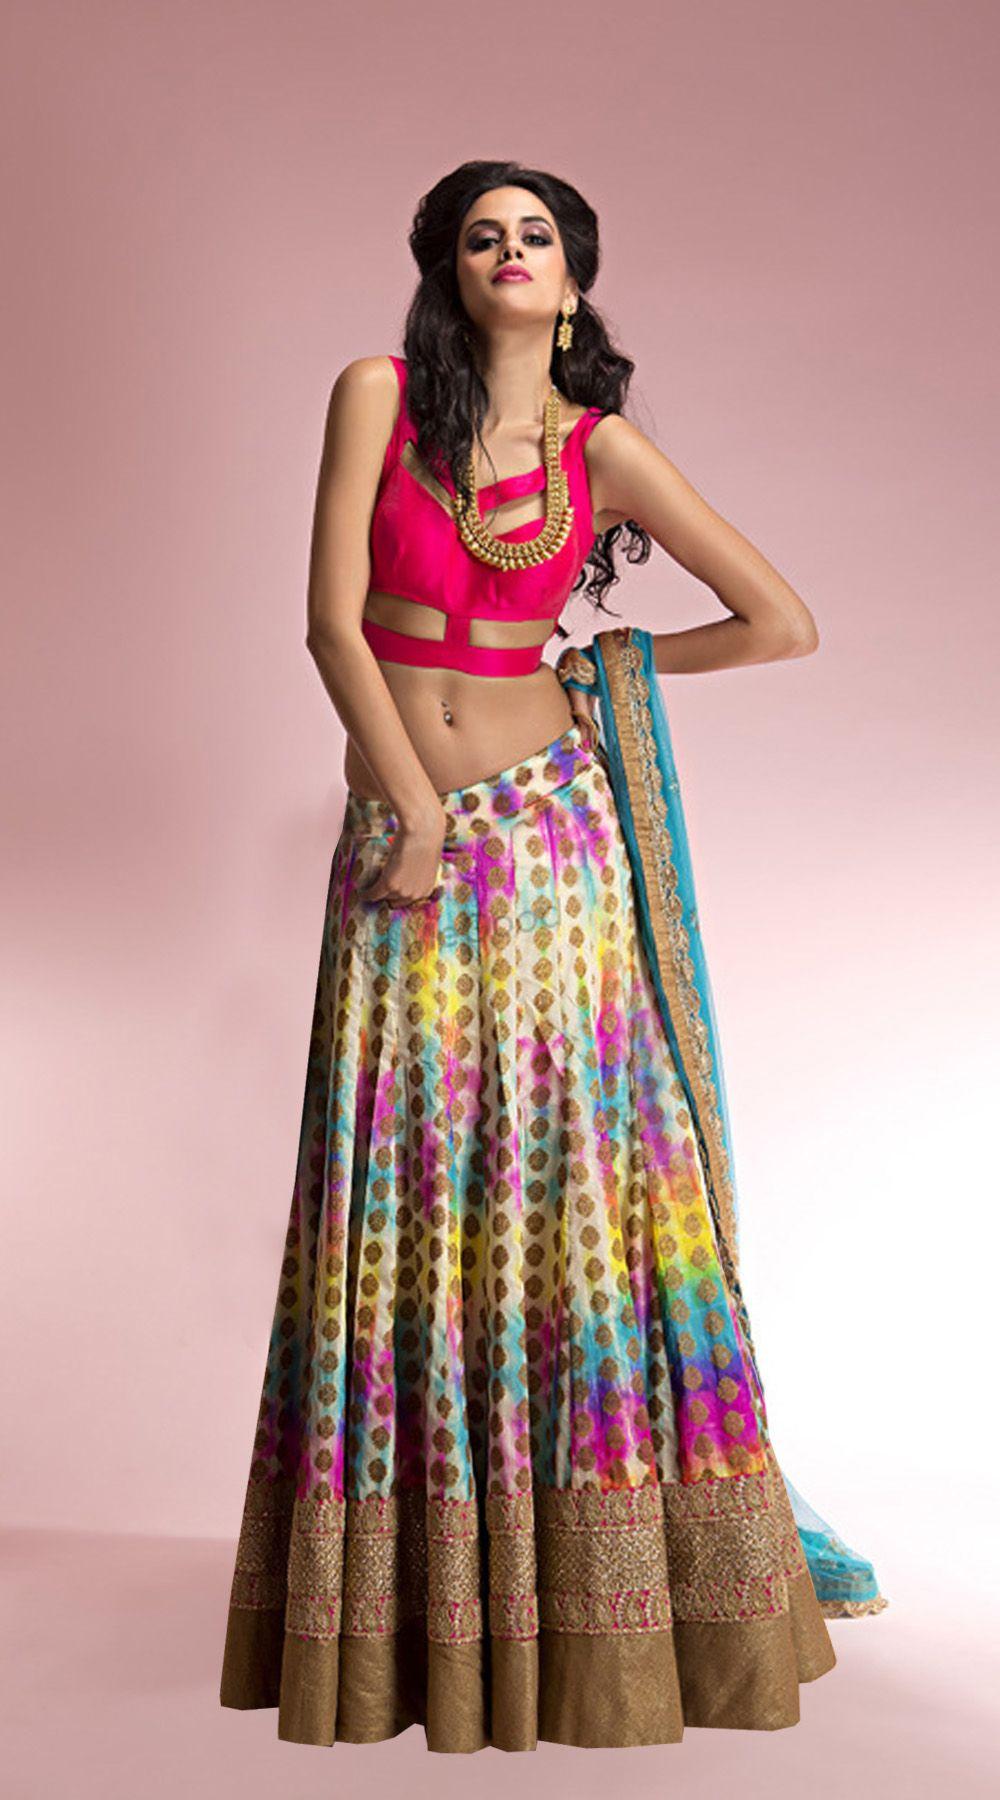 82770e49d49 Fashion Smart designer Lehenga Fabrics details   Top Fabrics   Cotton  Bottom Fabrics   Cotton Top Colour   PInk Bottom Colour   Multi Inner   Silk  Dupatta ...